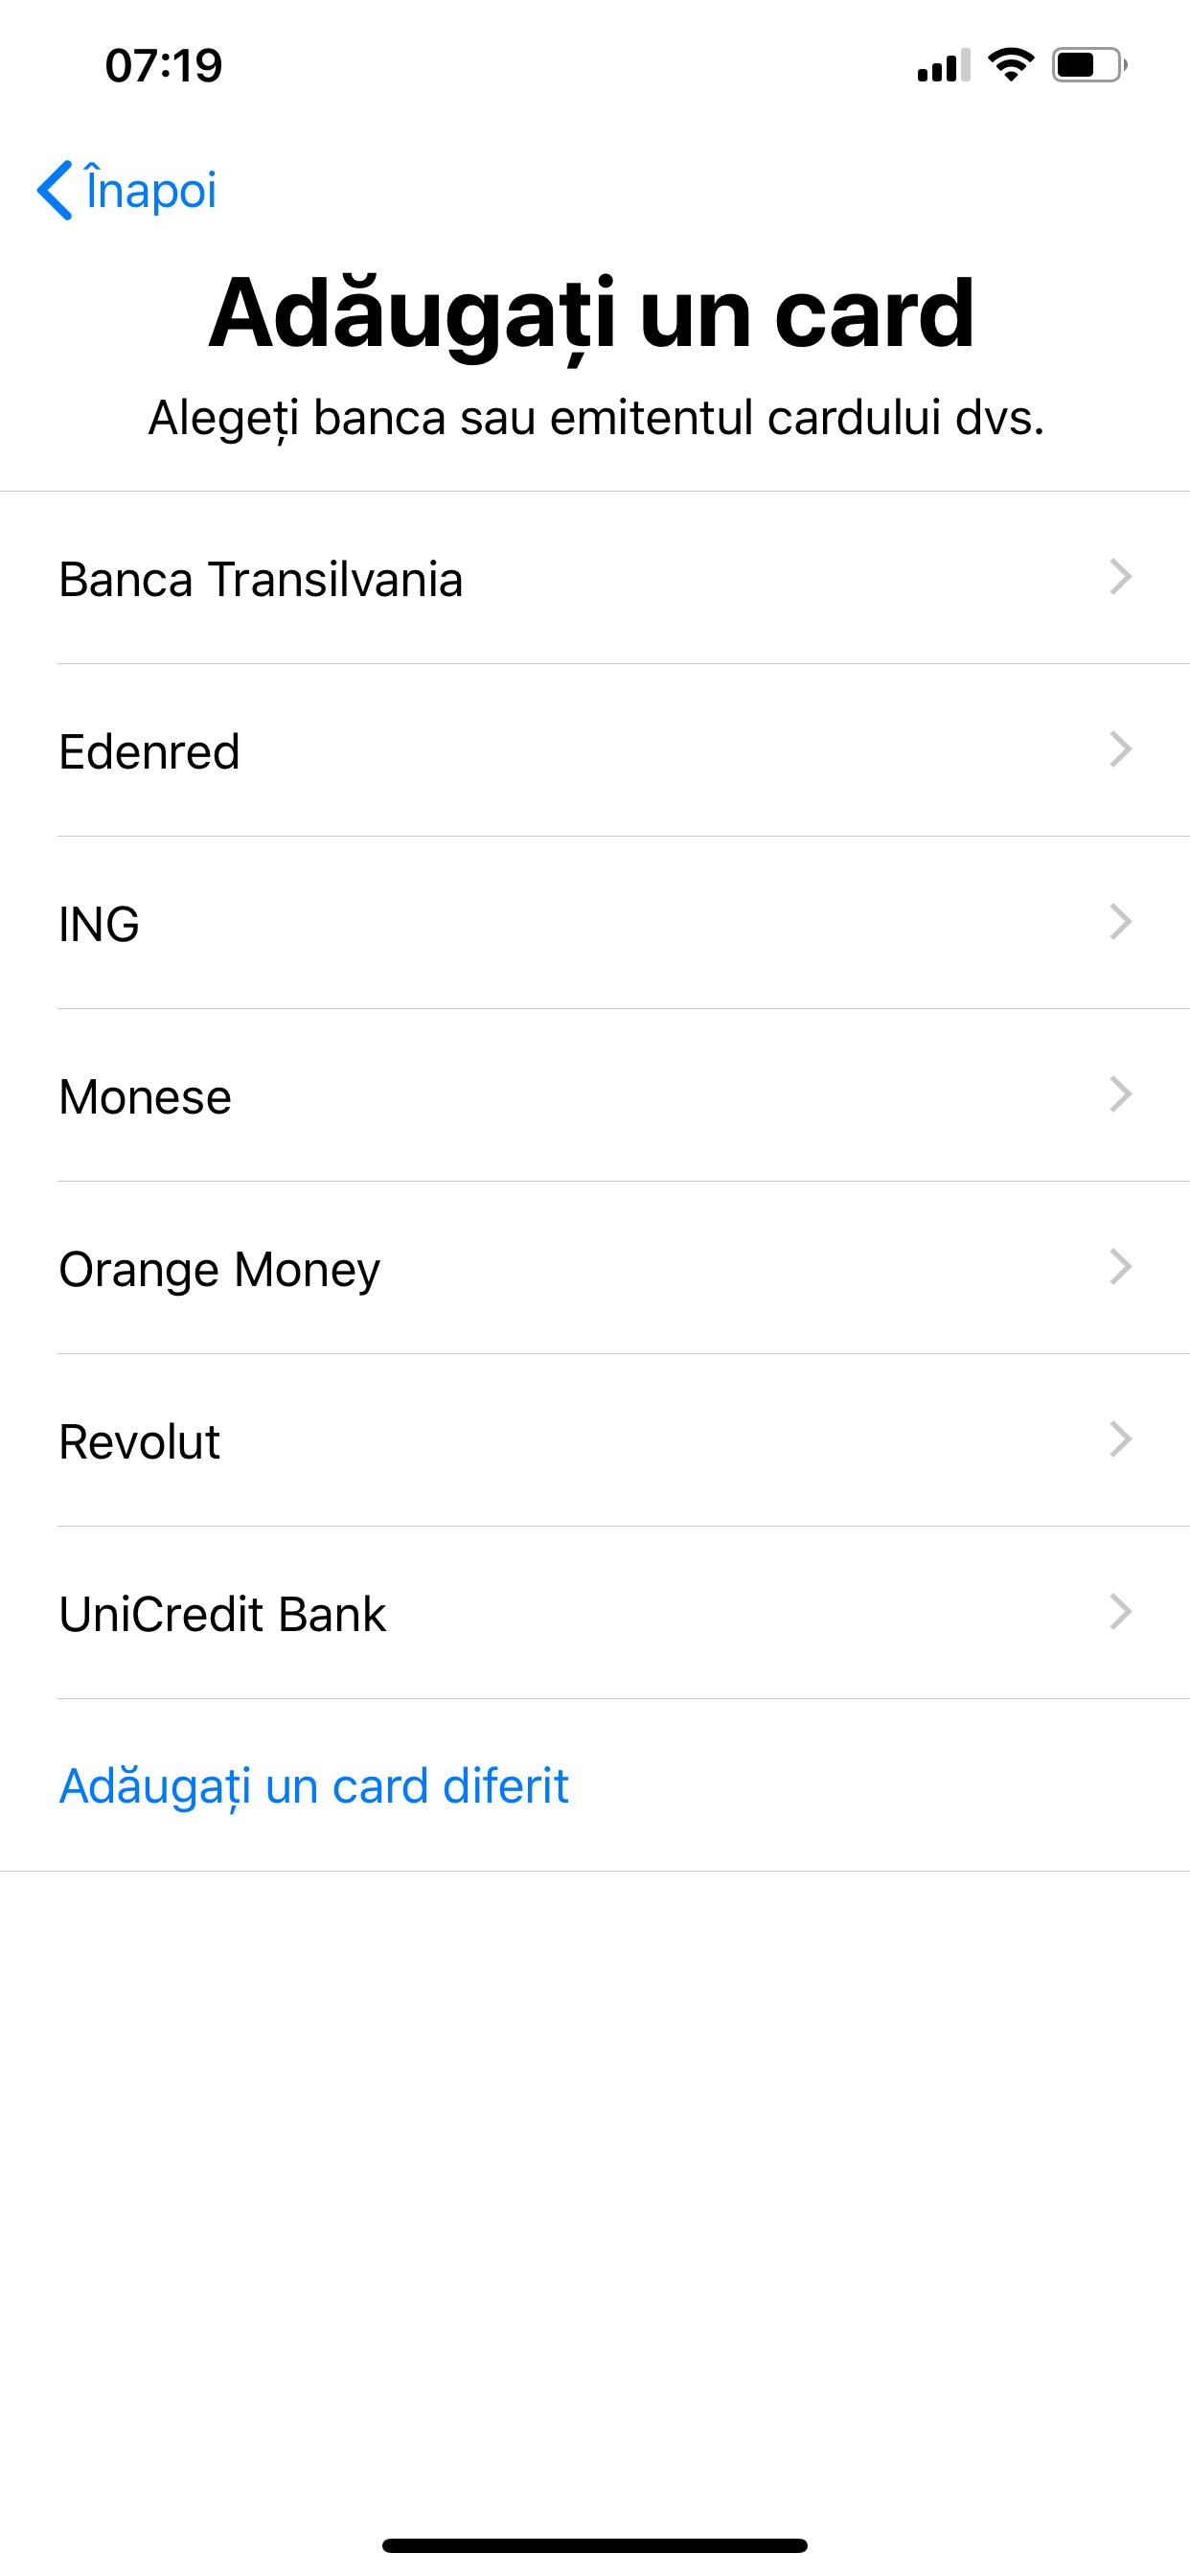 adaugi card apple pay iphone ipad romania